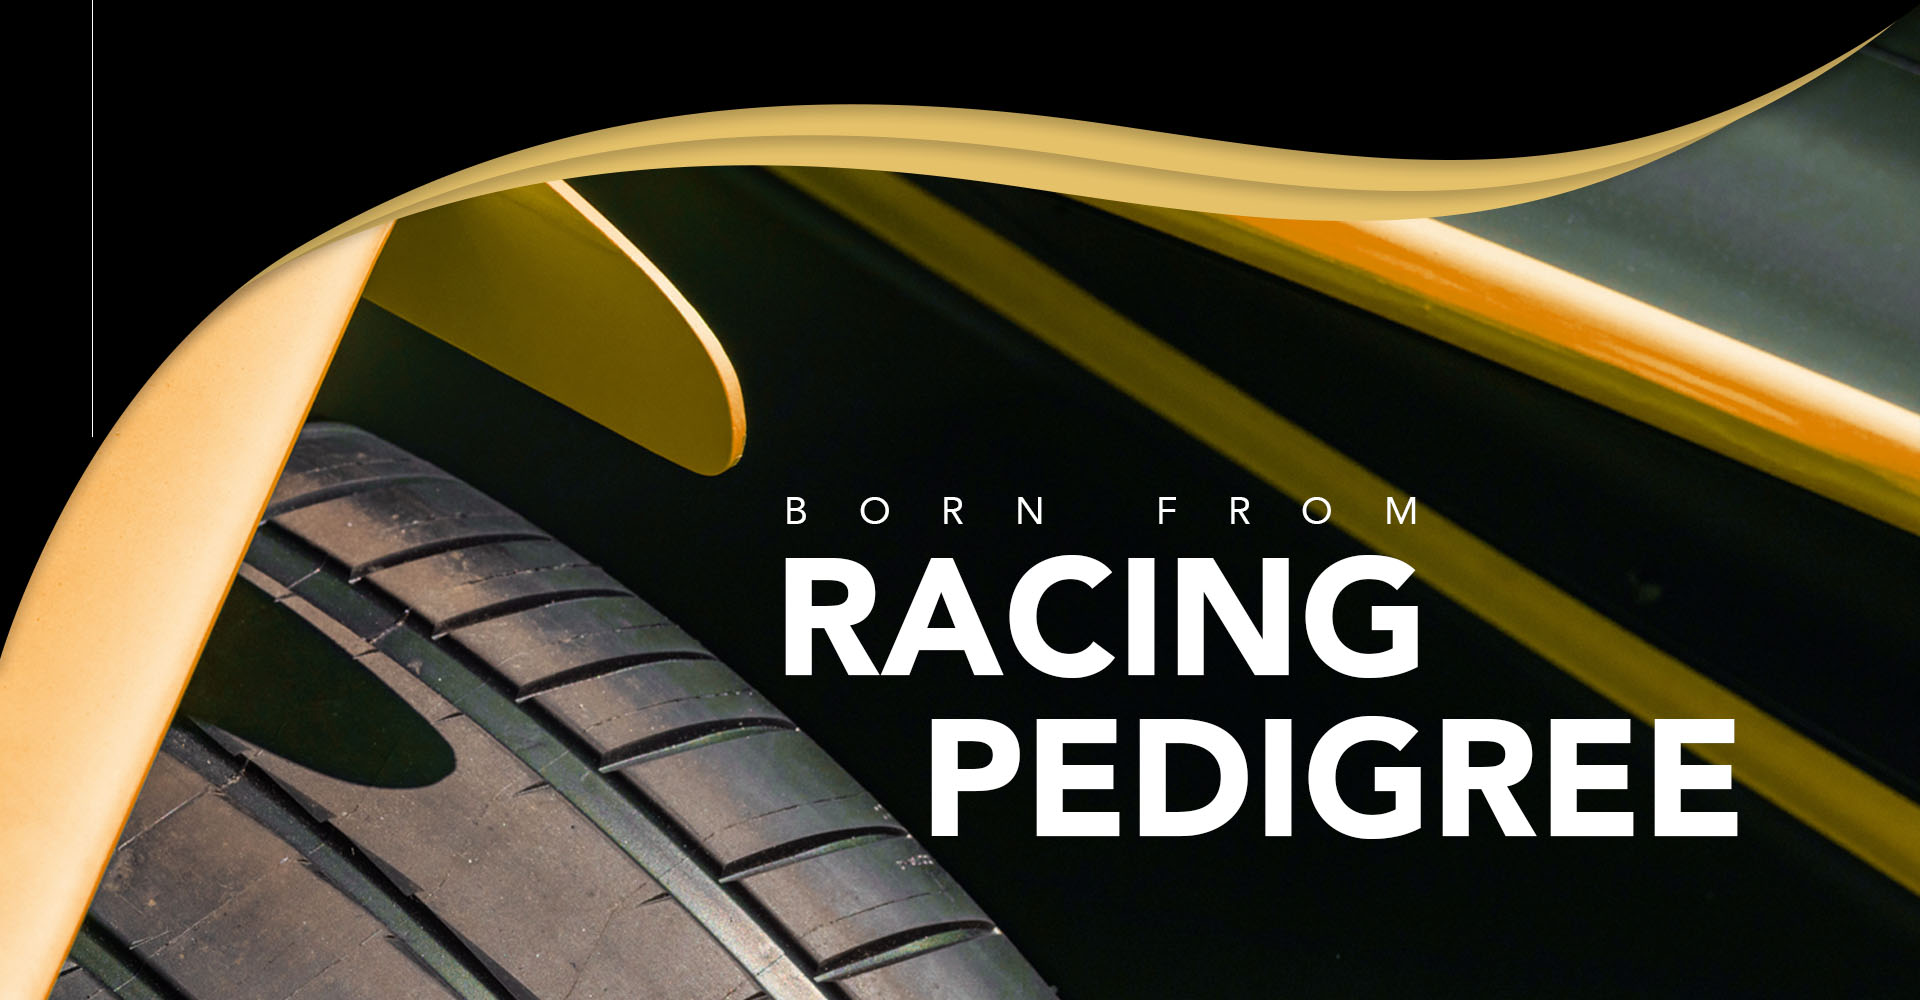 Born from racing pedigree